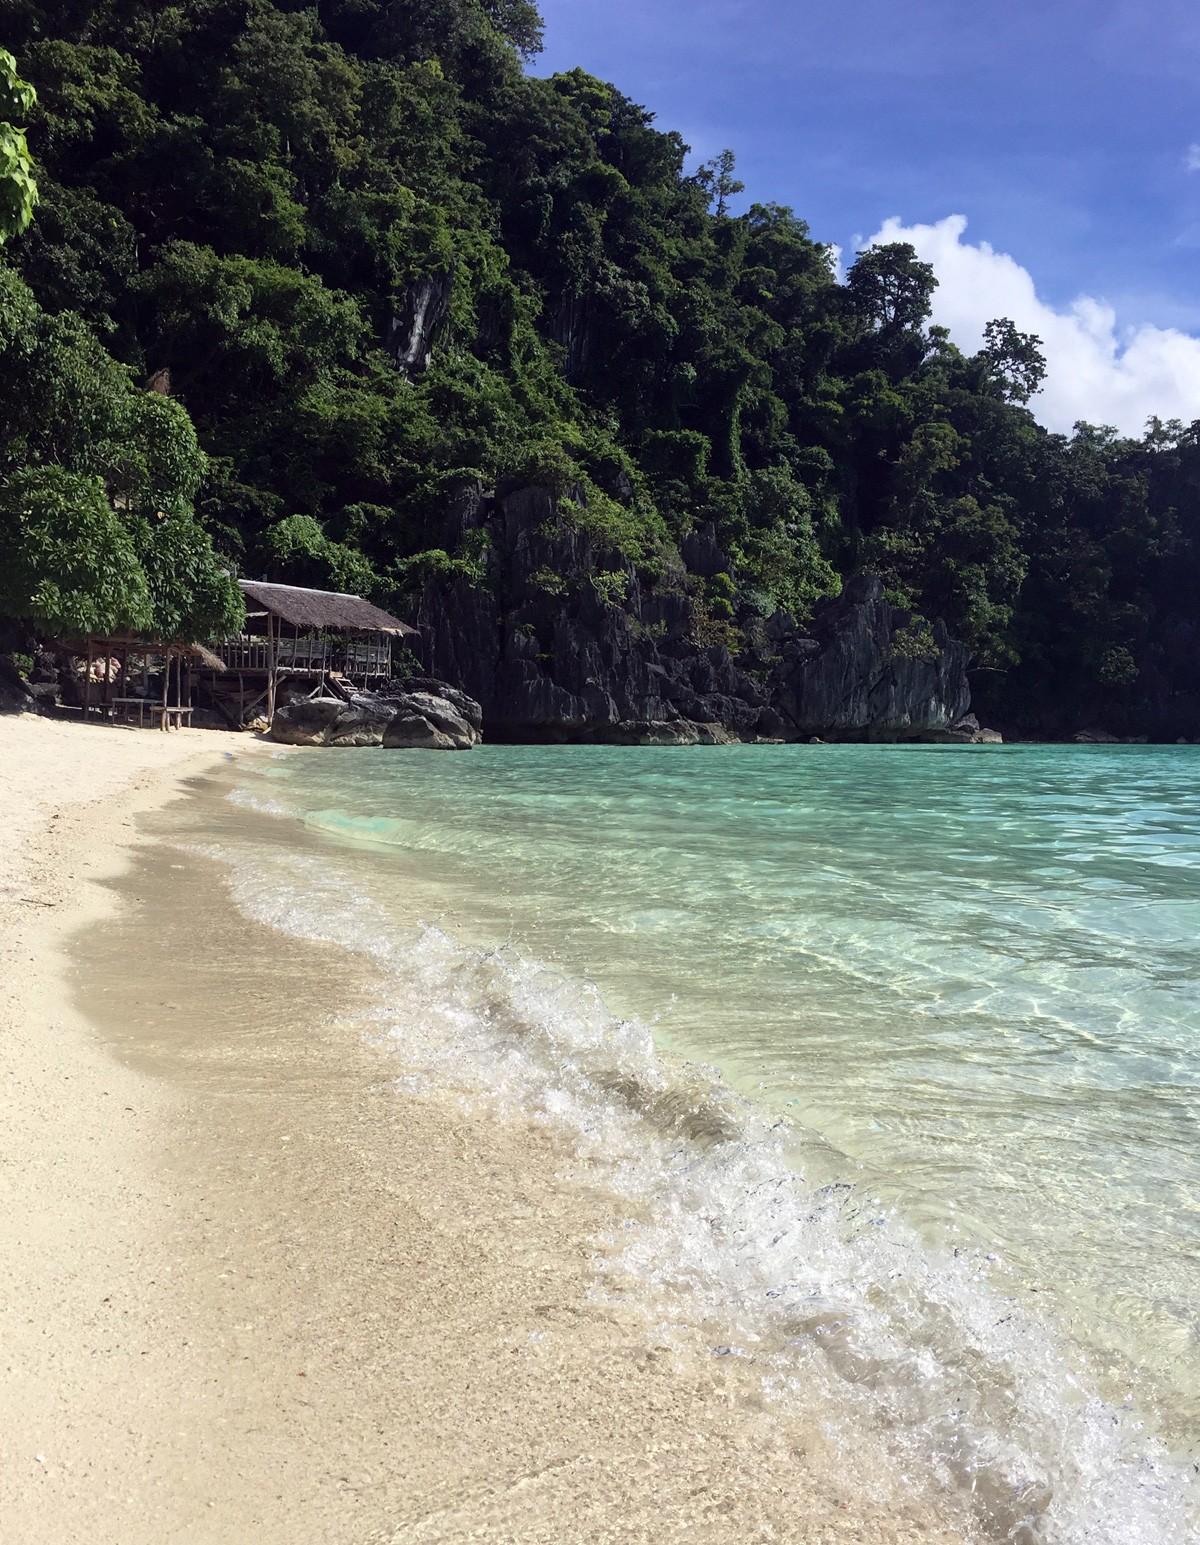 Banol paradise beach, Palawan